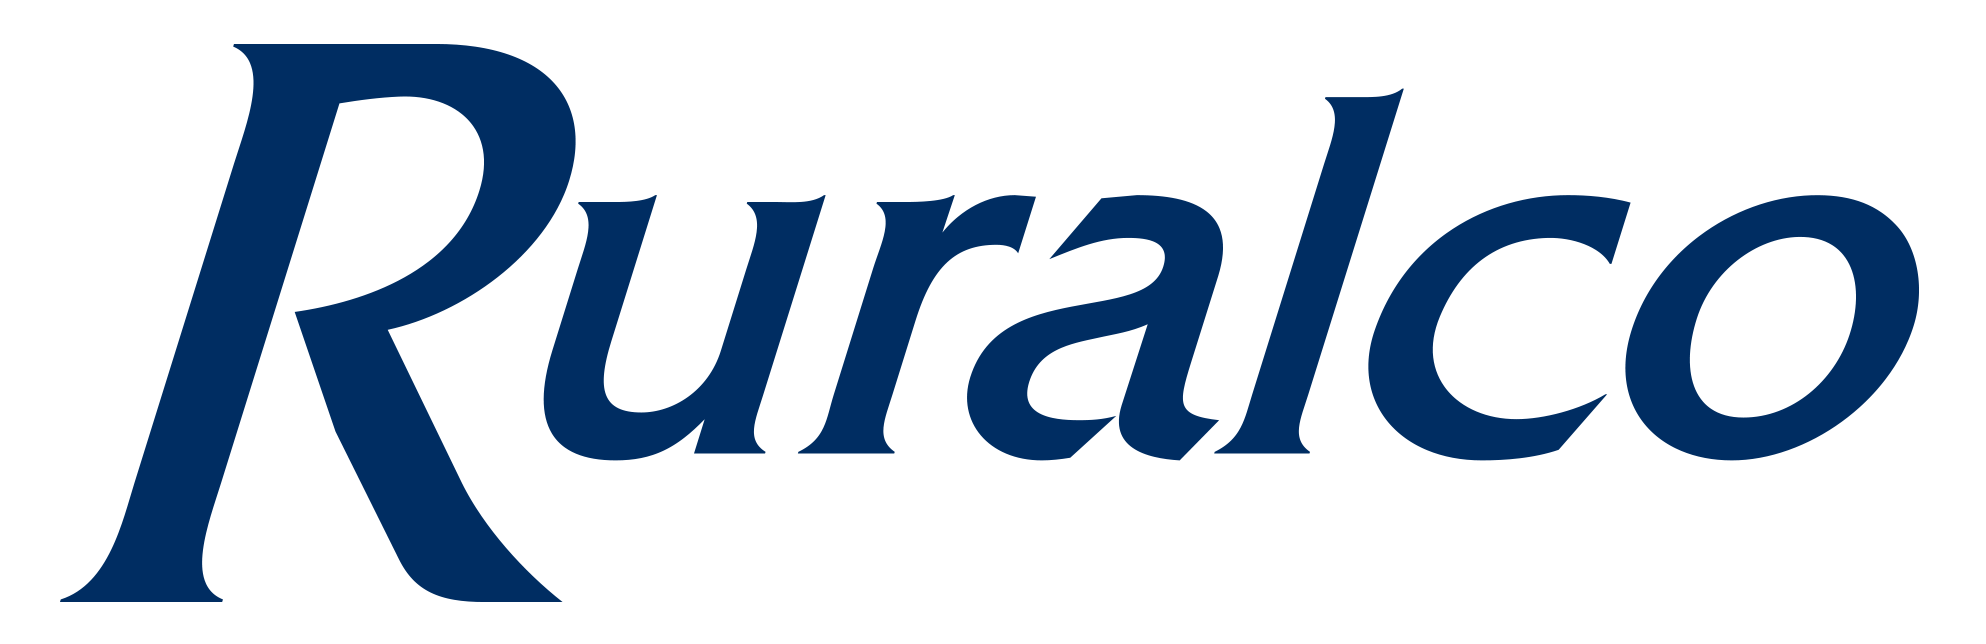 ruralco-logo.png